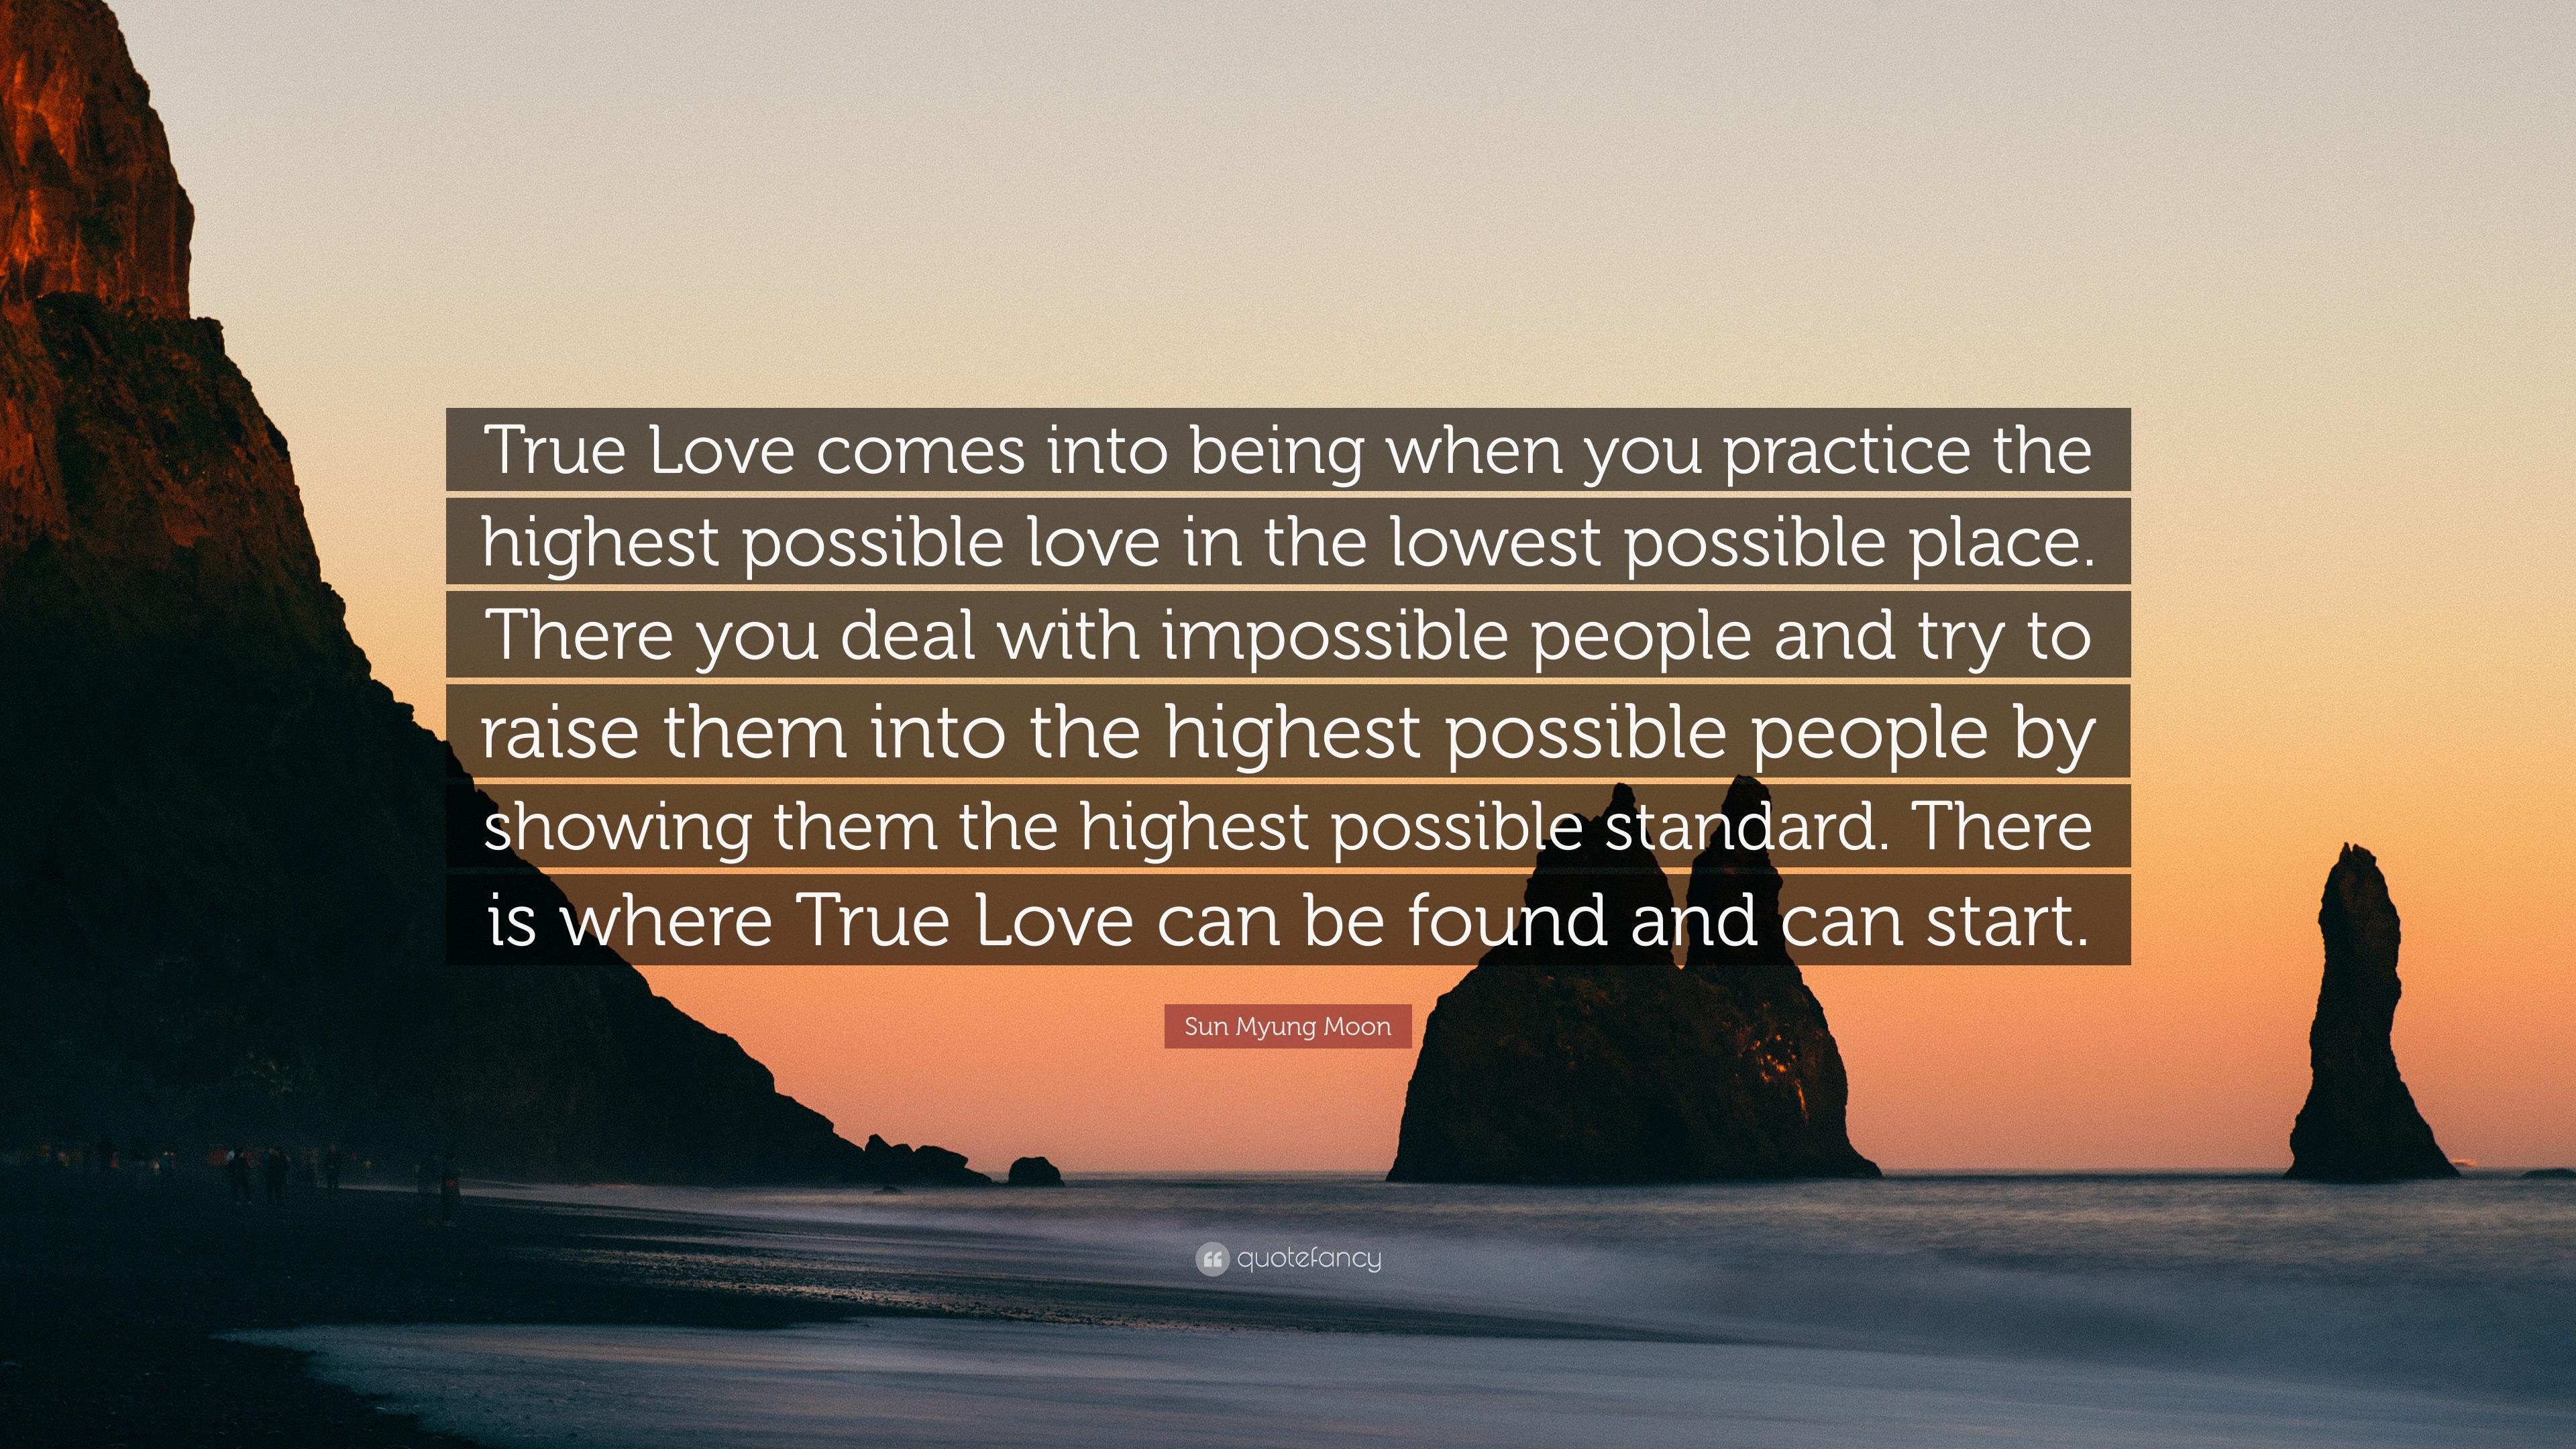 Sun Myung Moon Quotes 51 Wallpapers Quotefancy